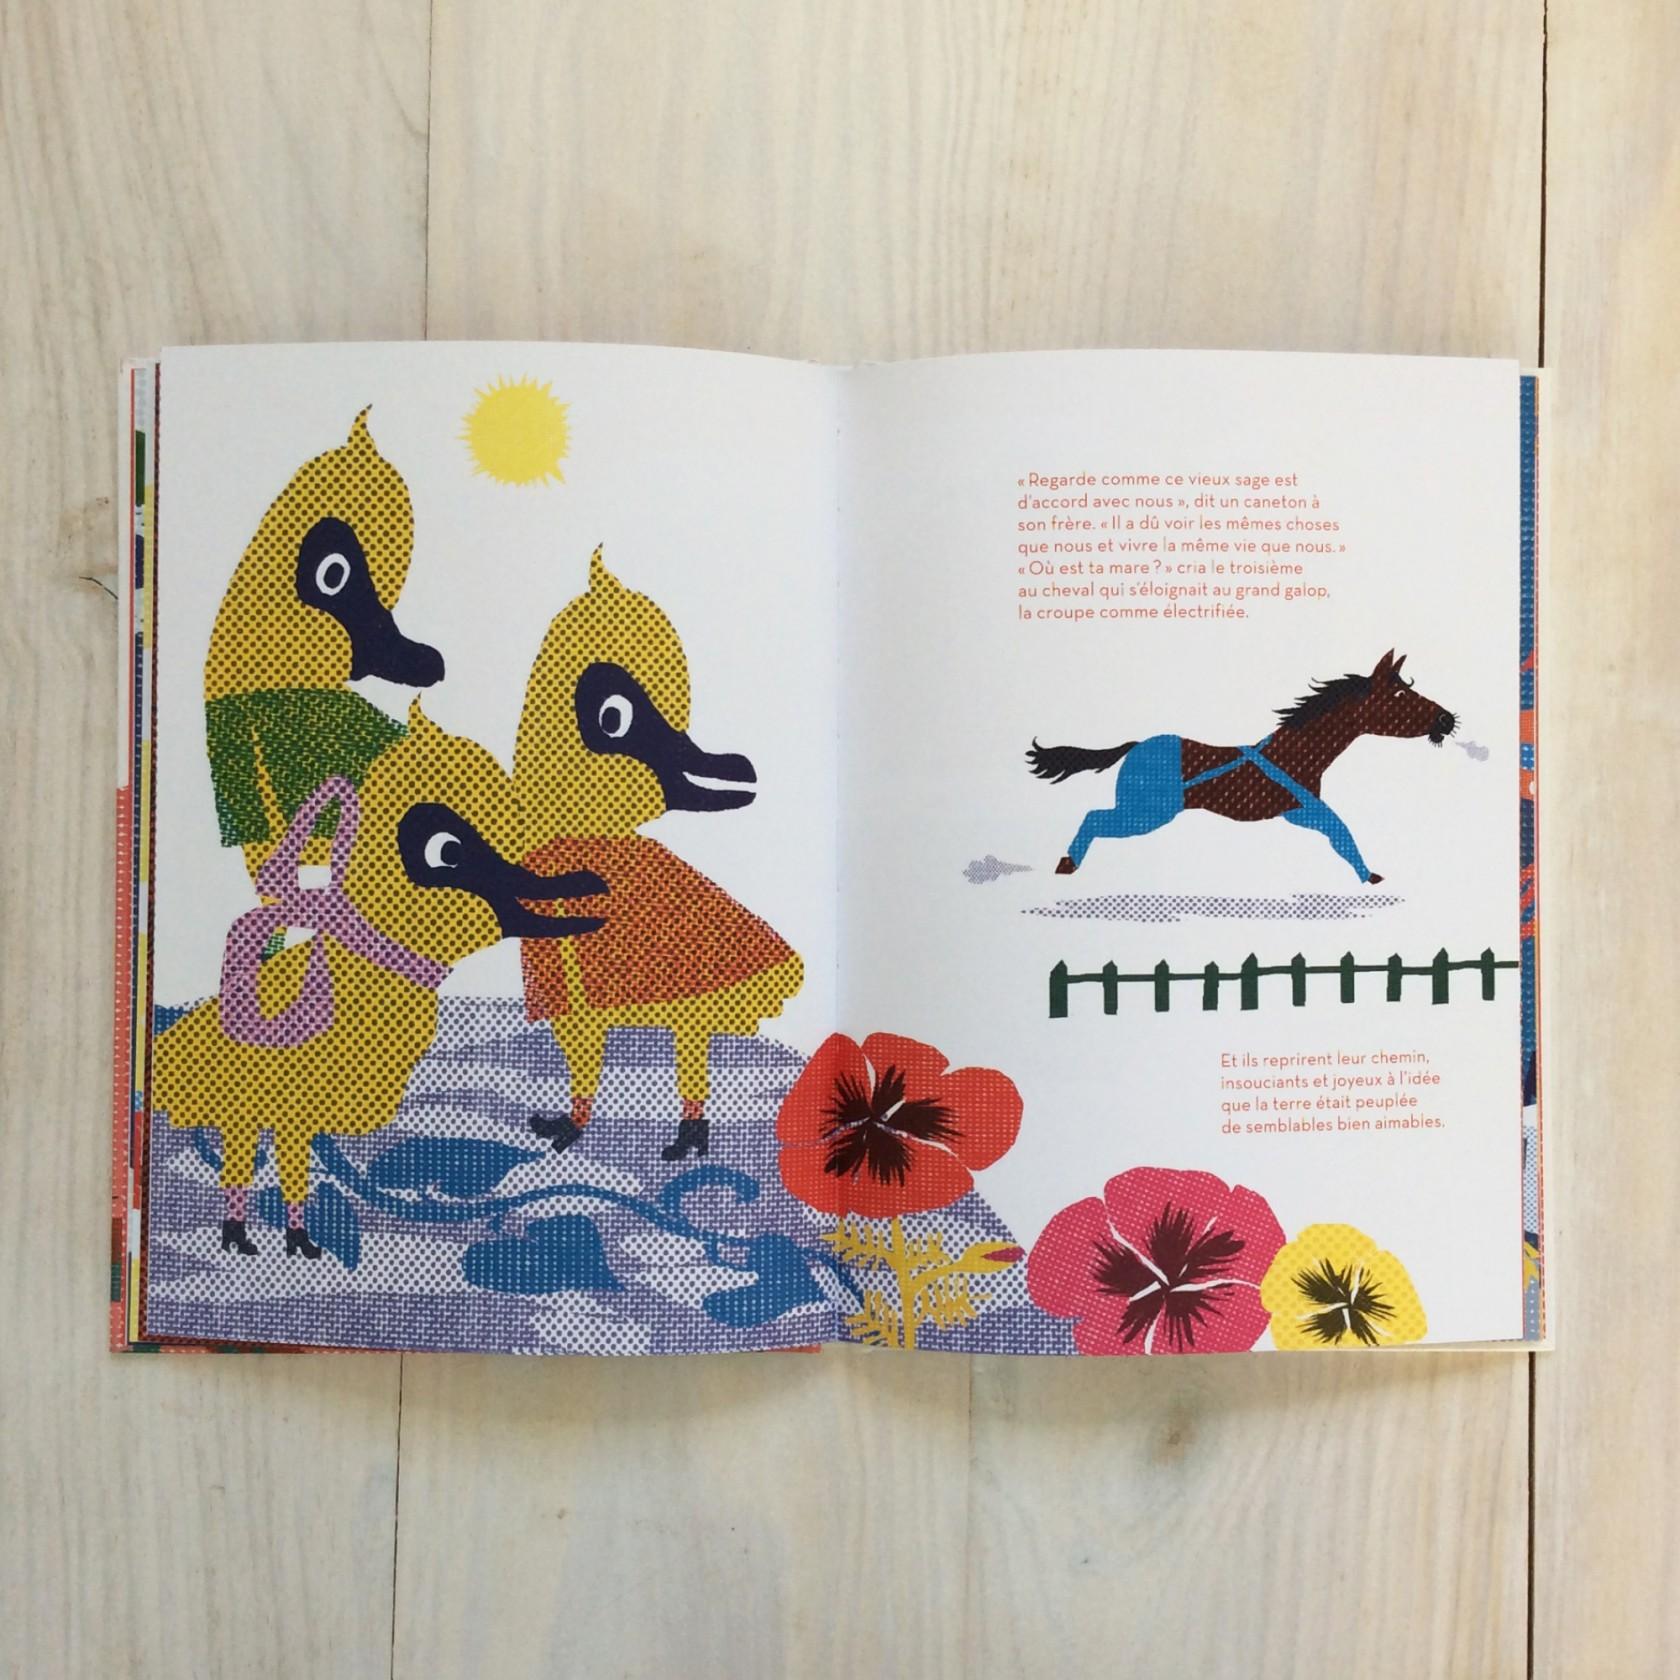 fouinzanardi -  fz_print.books_lesfourmsirouges13